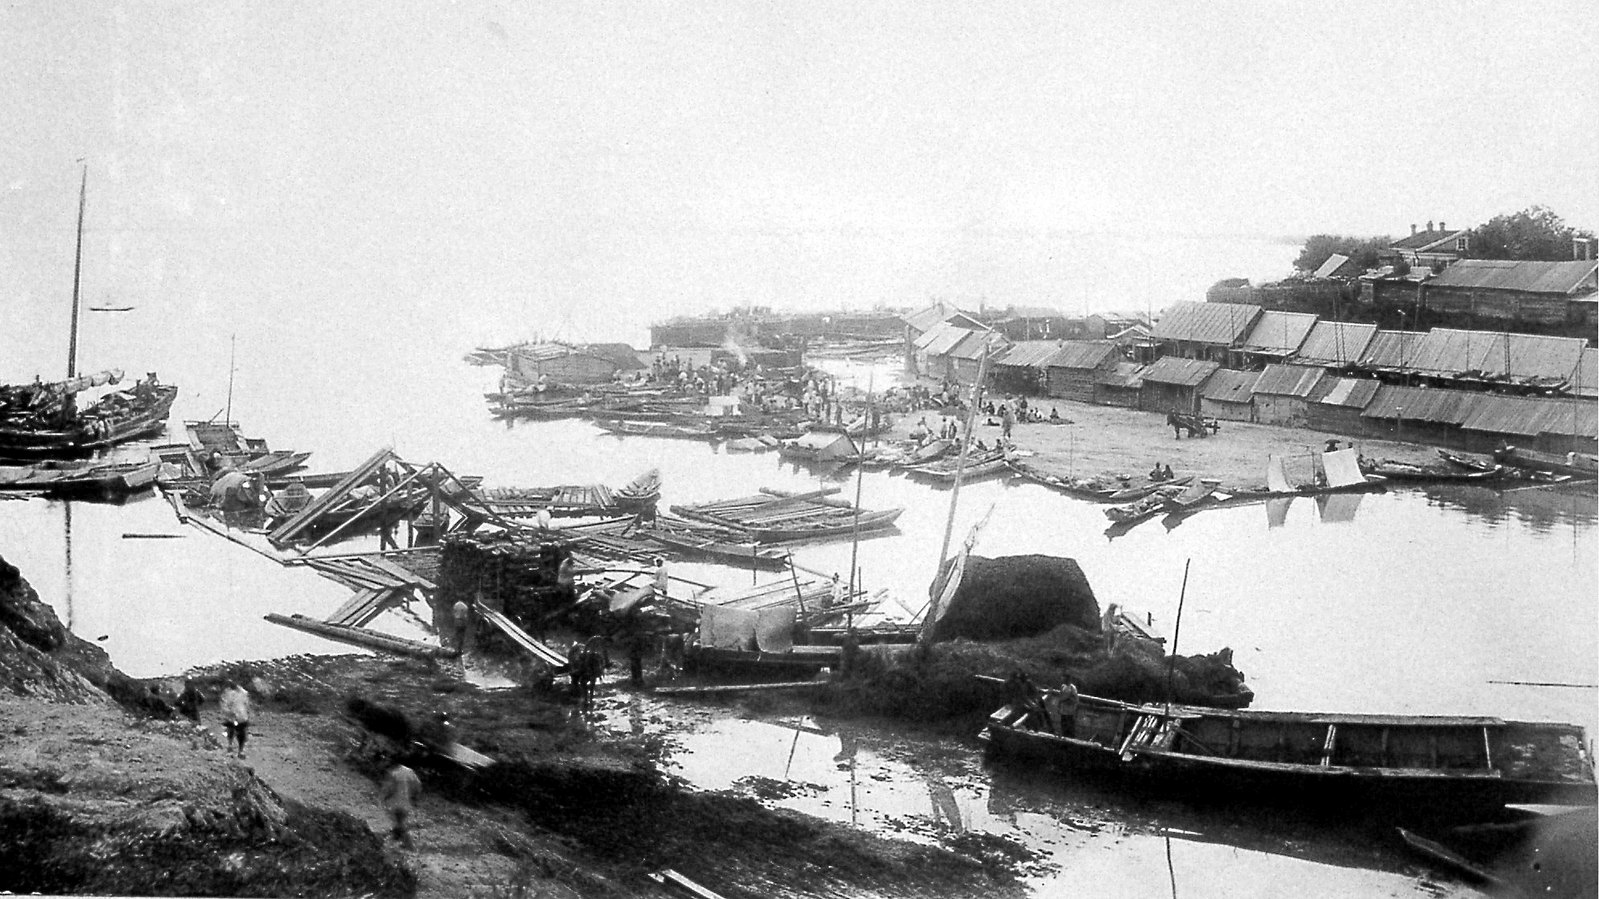 20. Устье р. Плюснинки. 1896